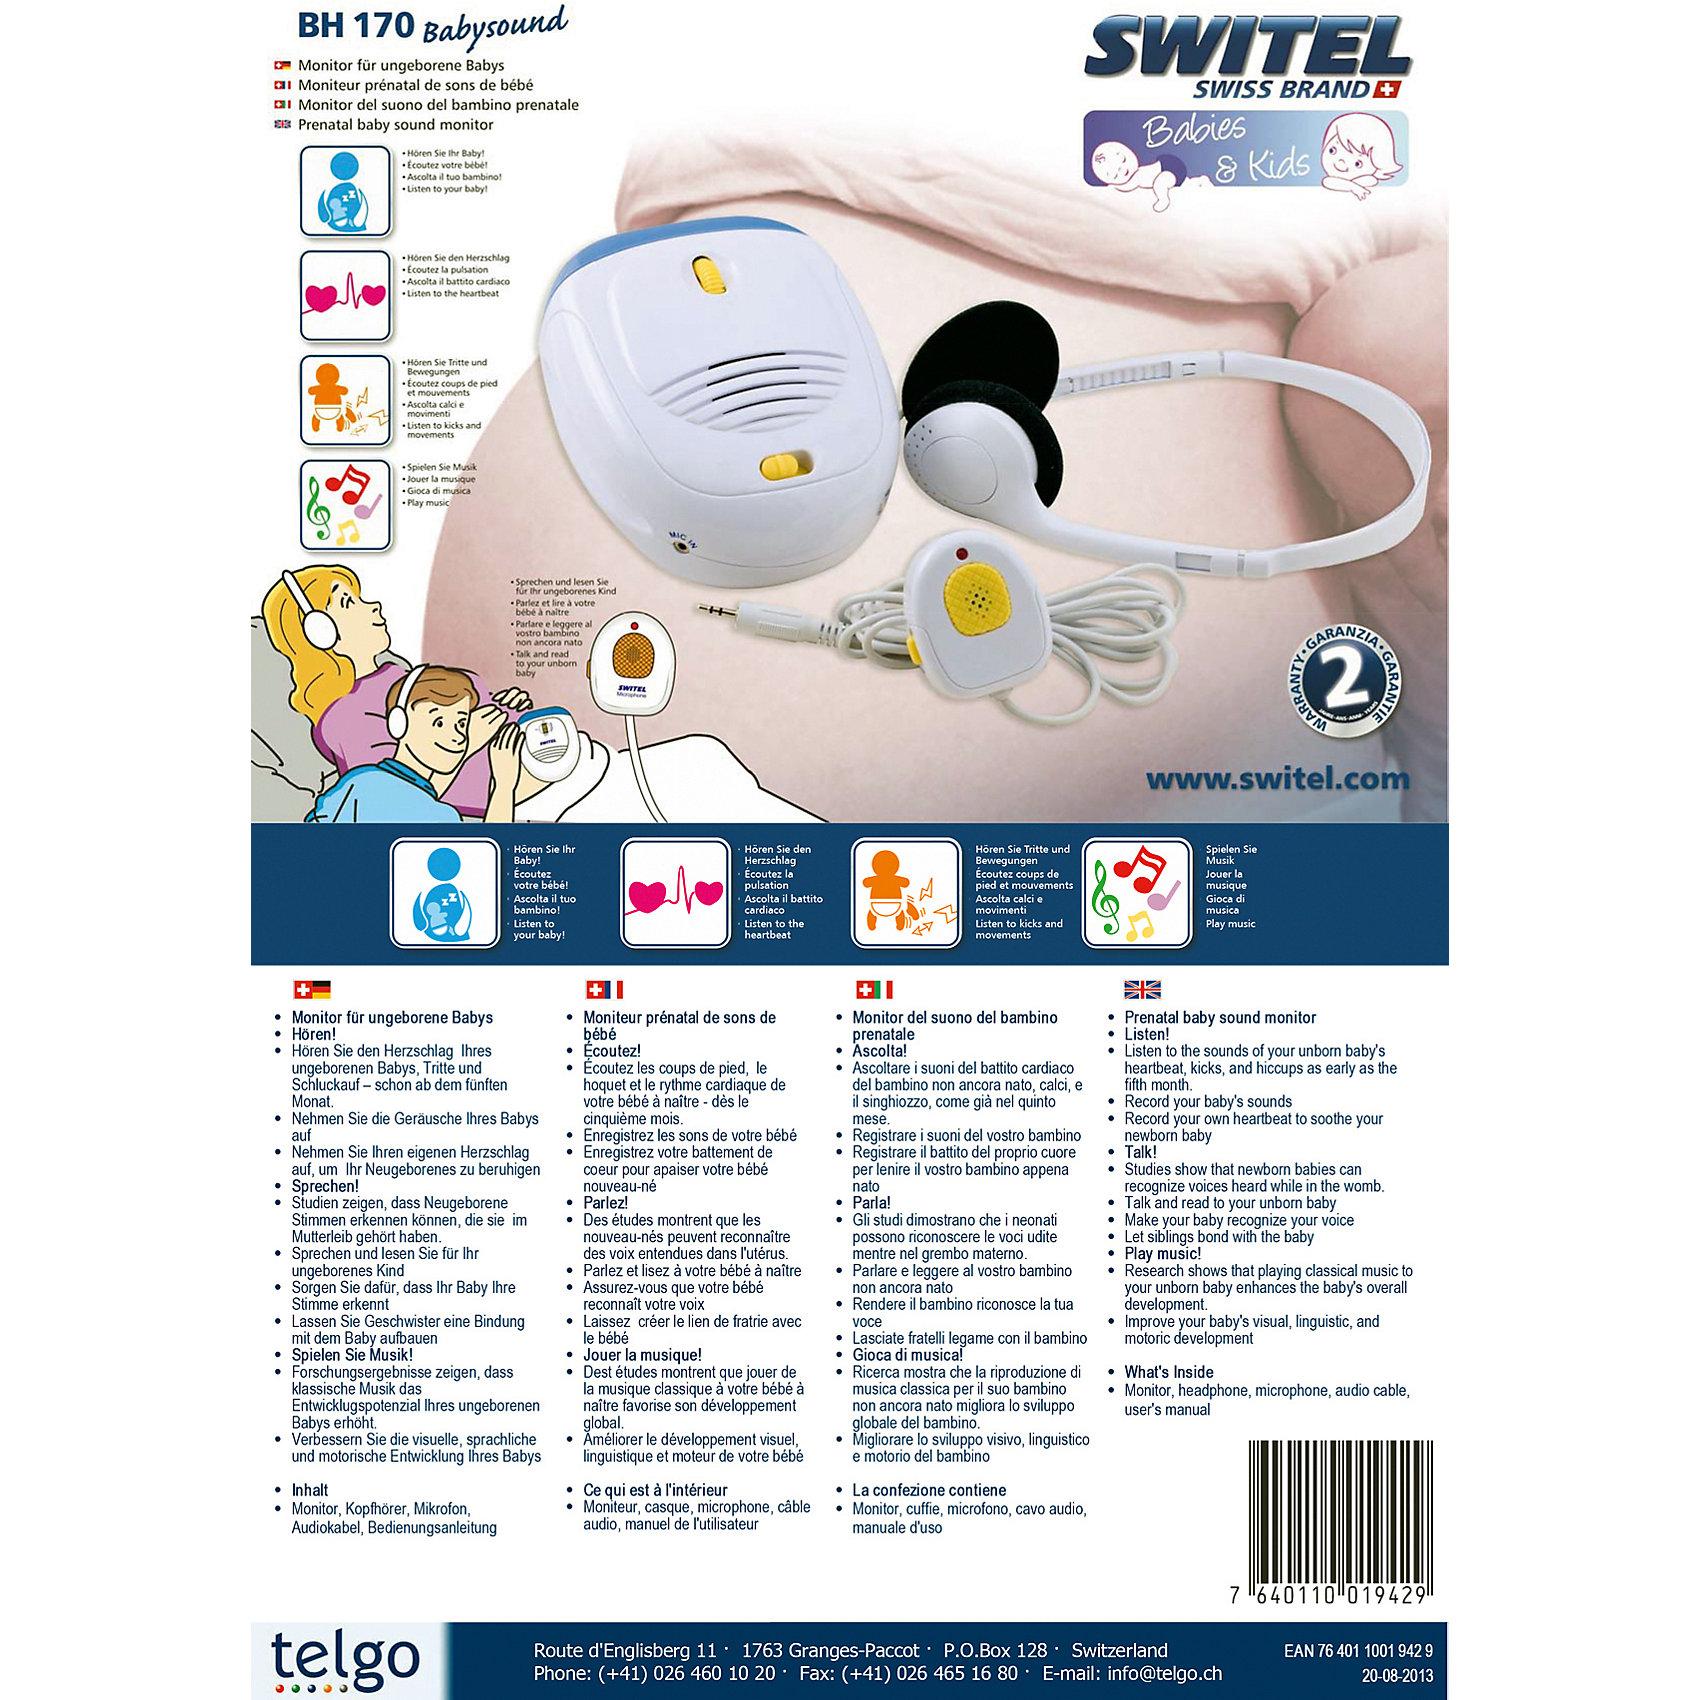 Электронный стетоскоп для будущей мамы BH170, SWITEL